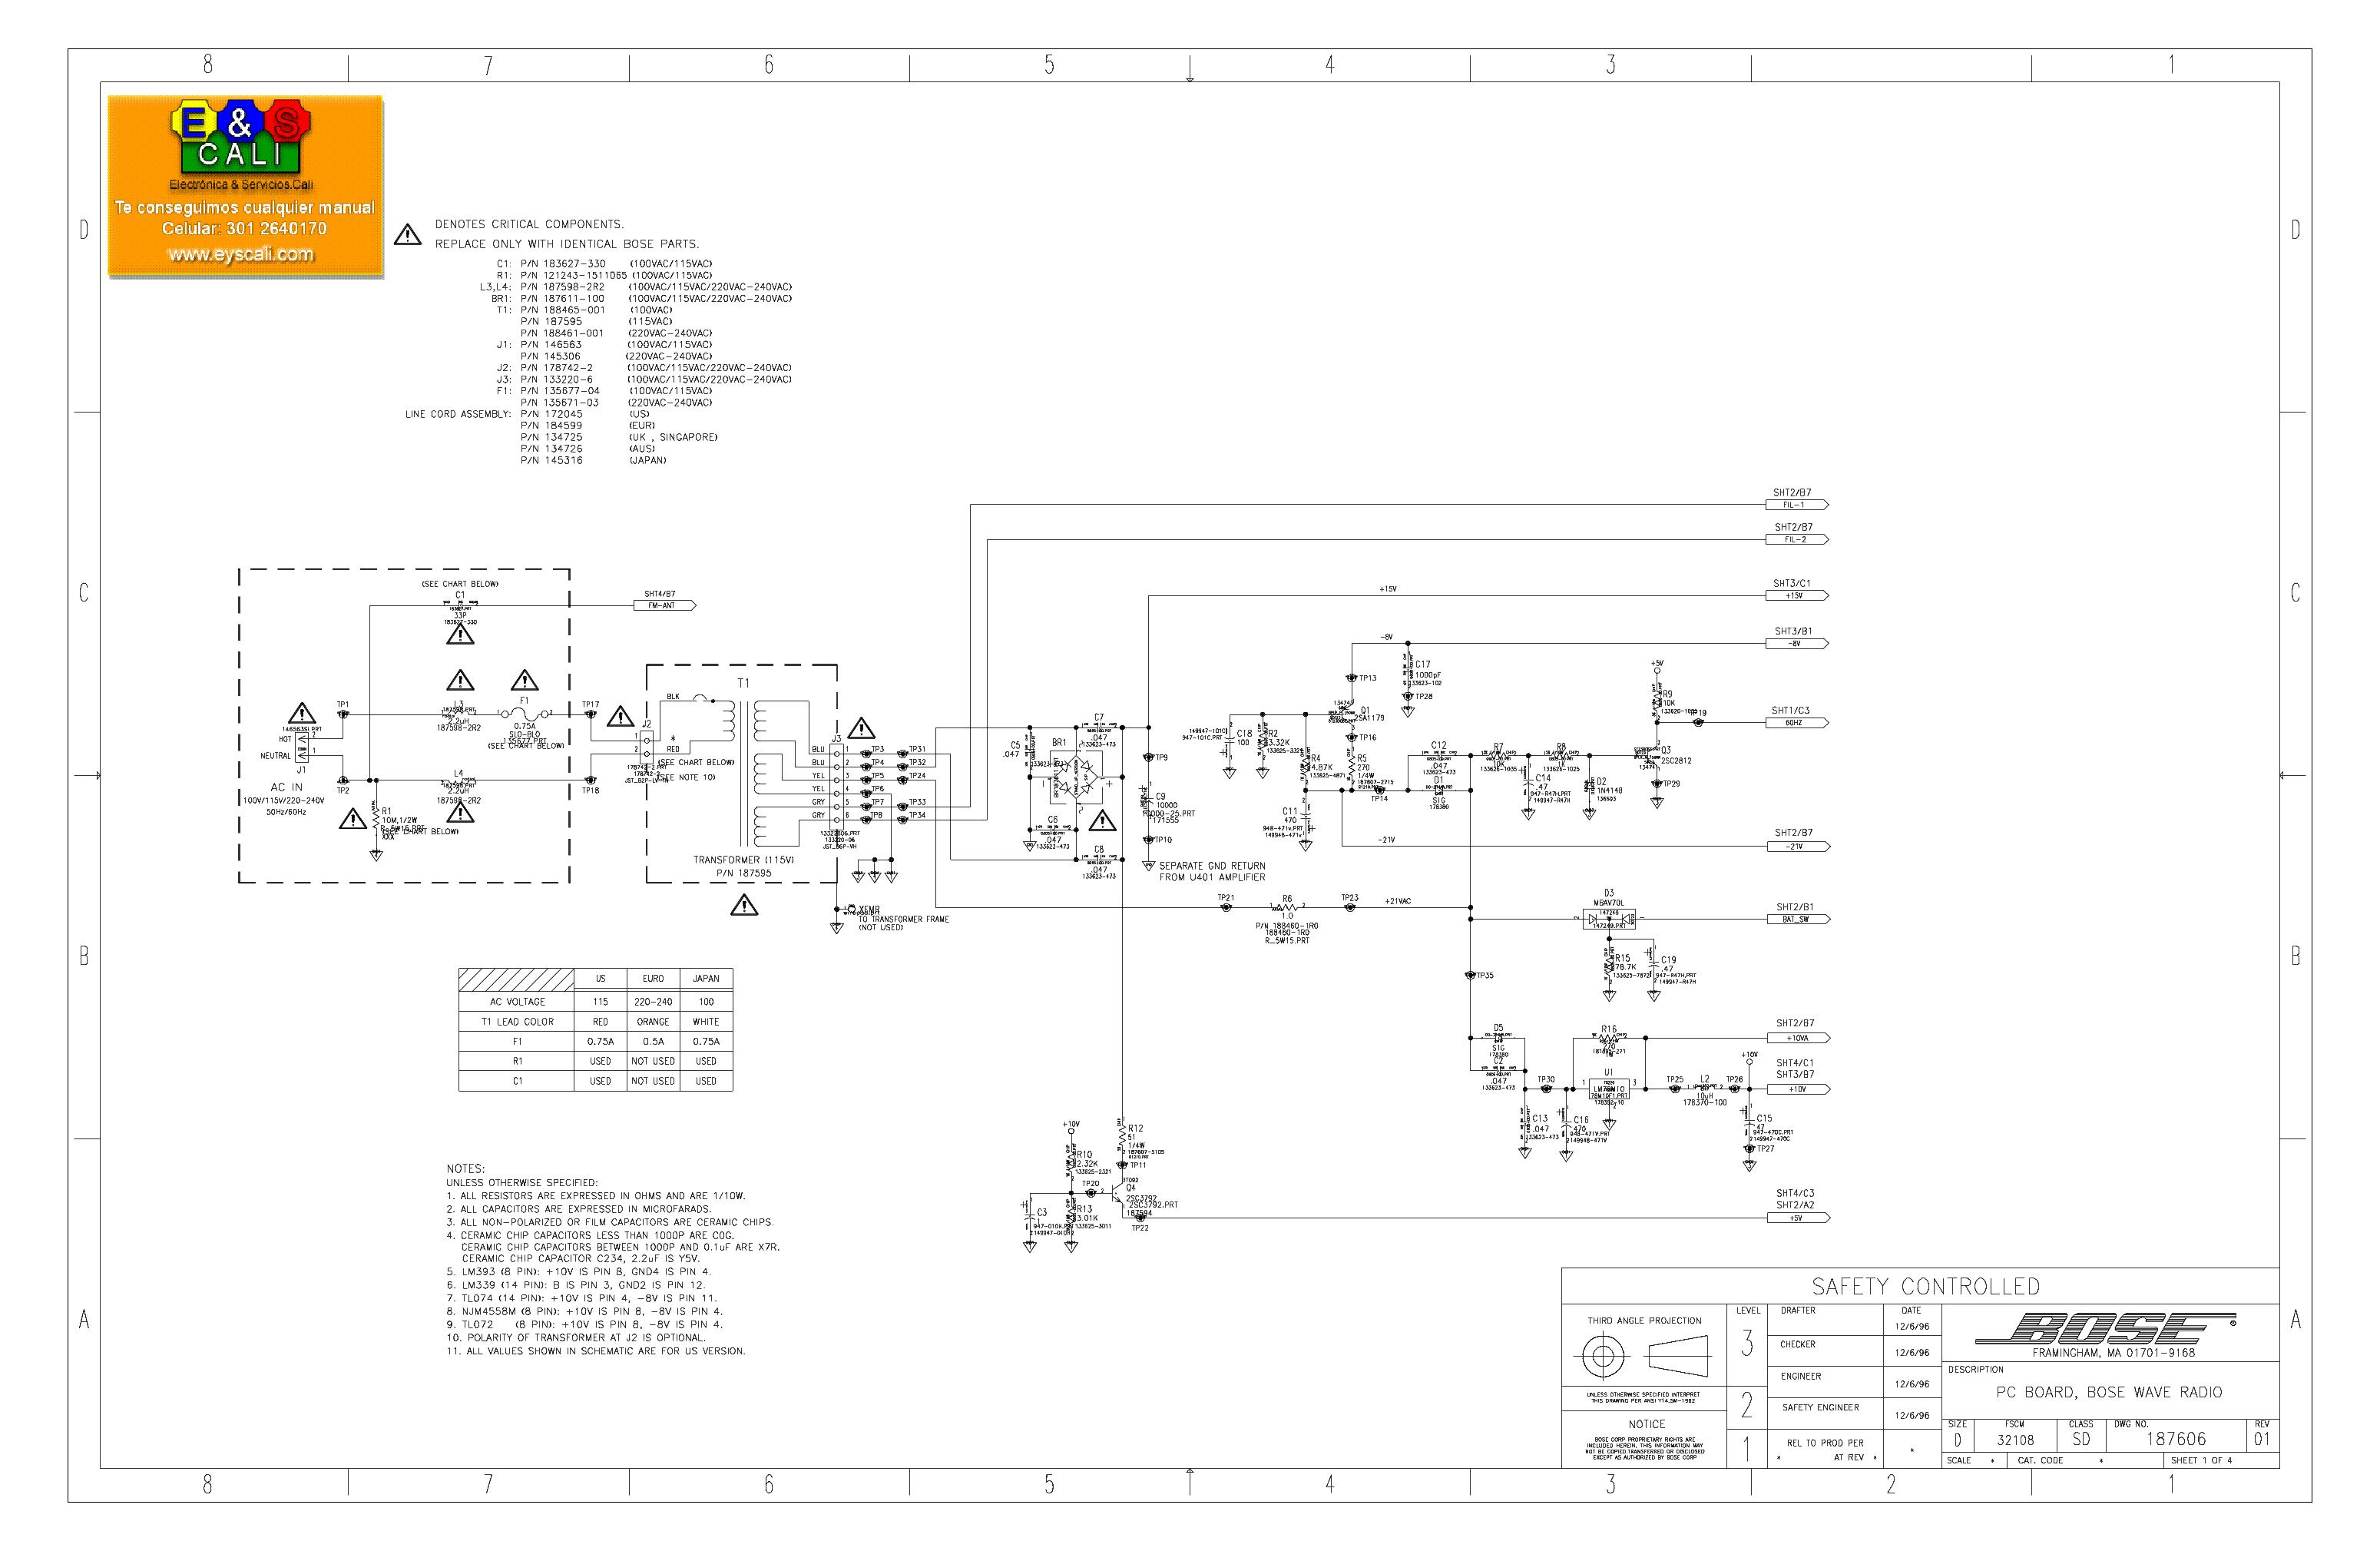 Bose Service Schematics -Cold Room Wiring Diagram Pdf   Begeboy Wiring  Diagram SourceBegeboy Wiring Diagram Source